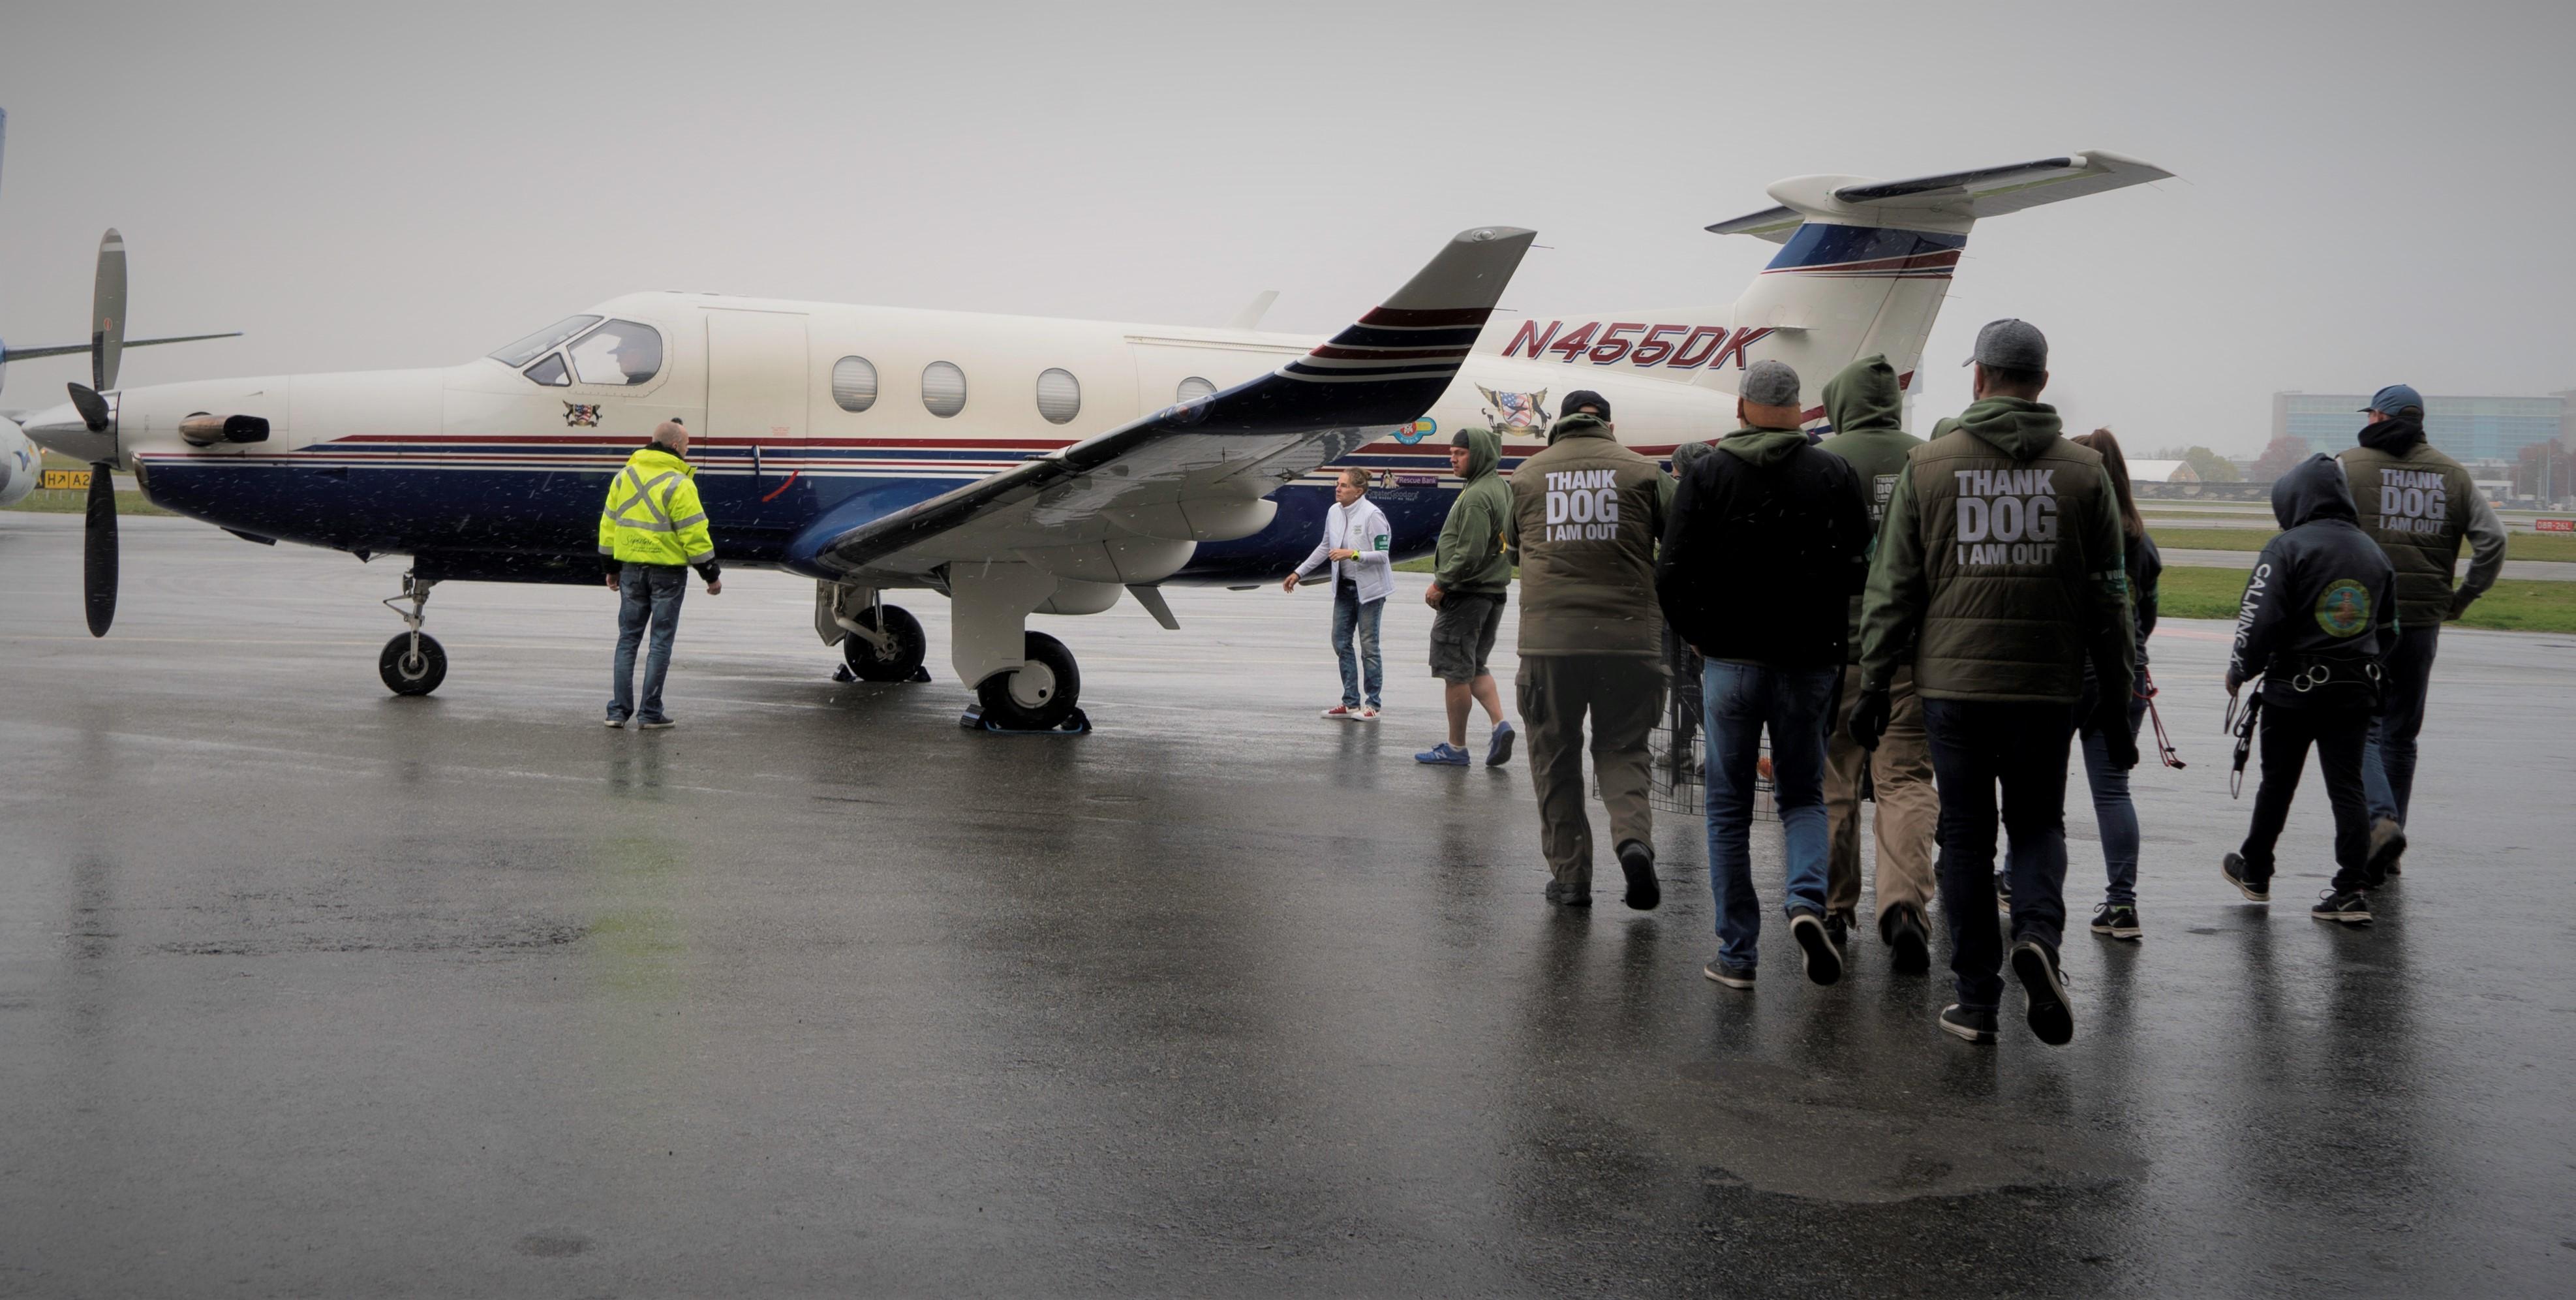 Plane at YVR people